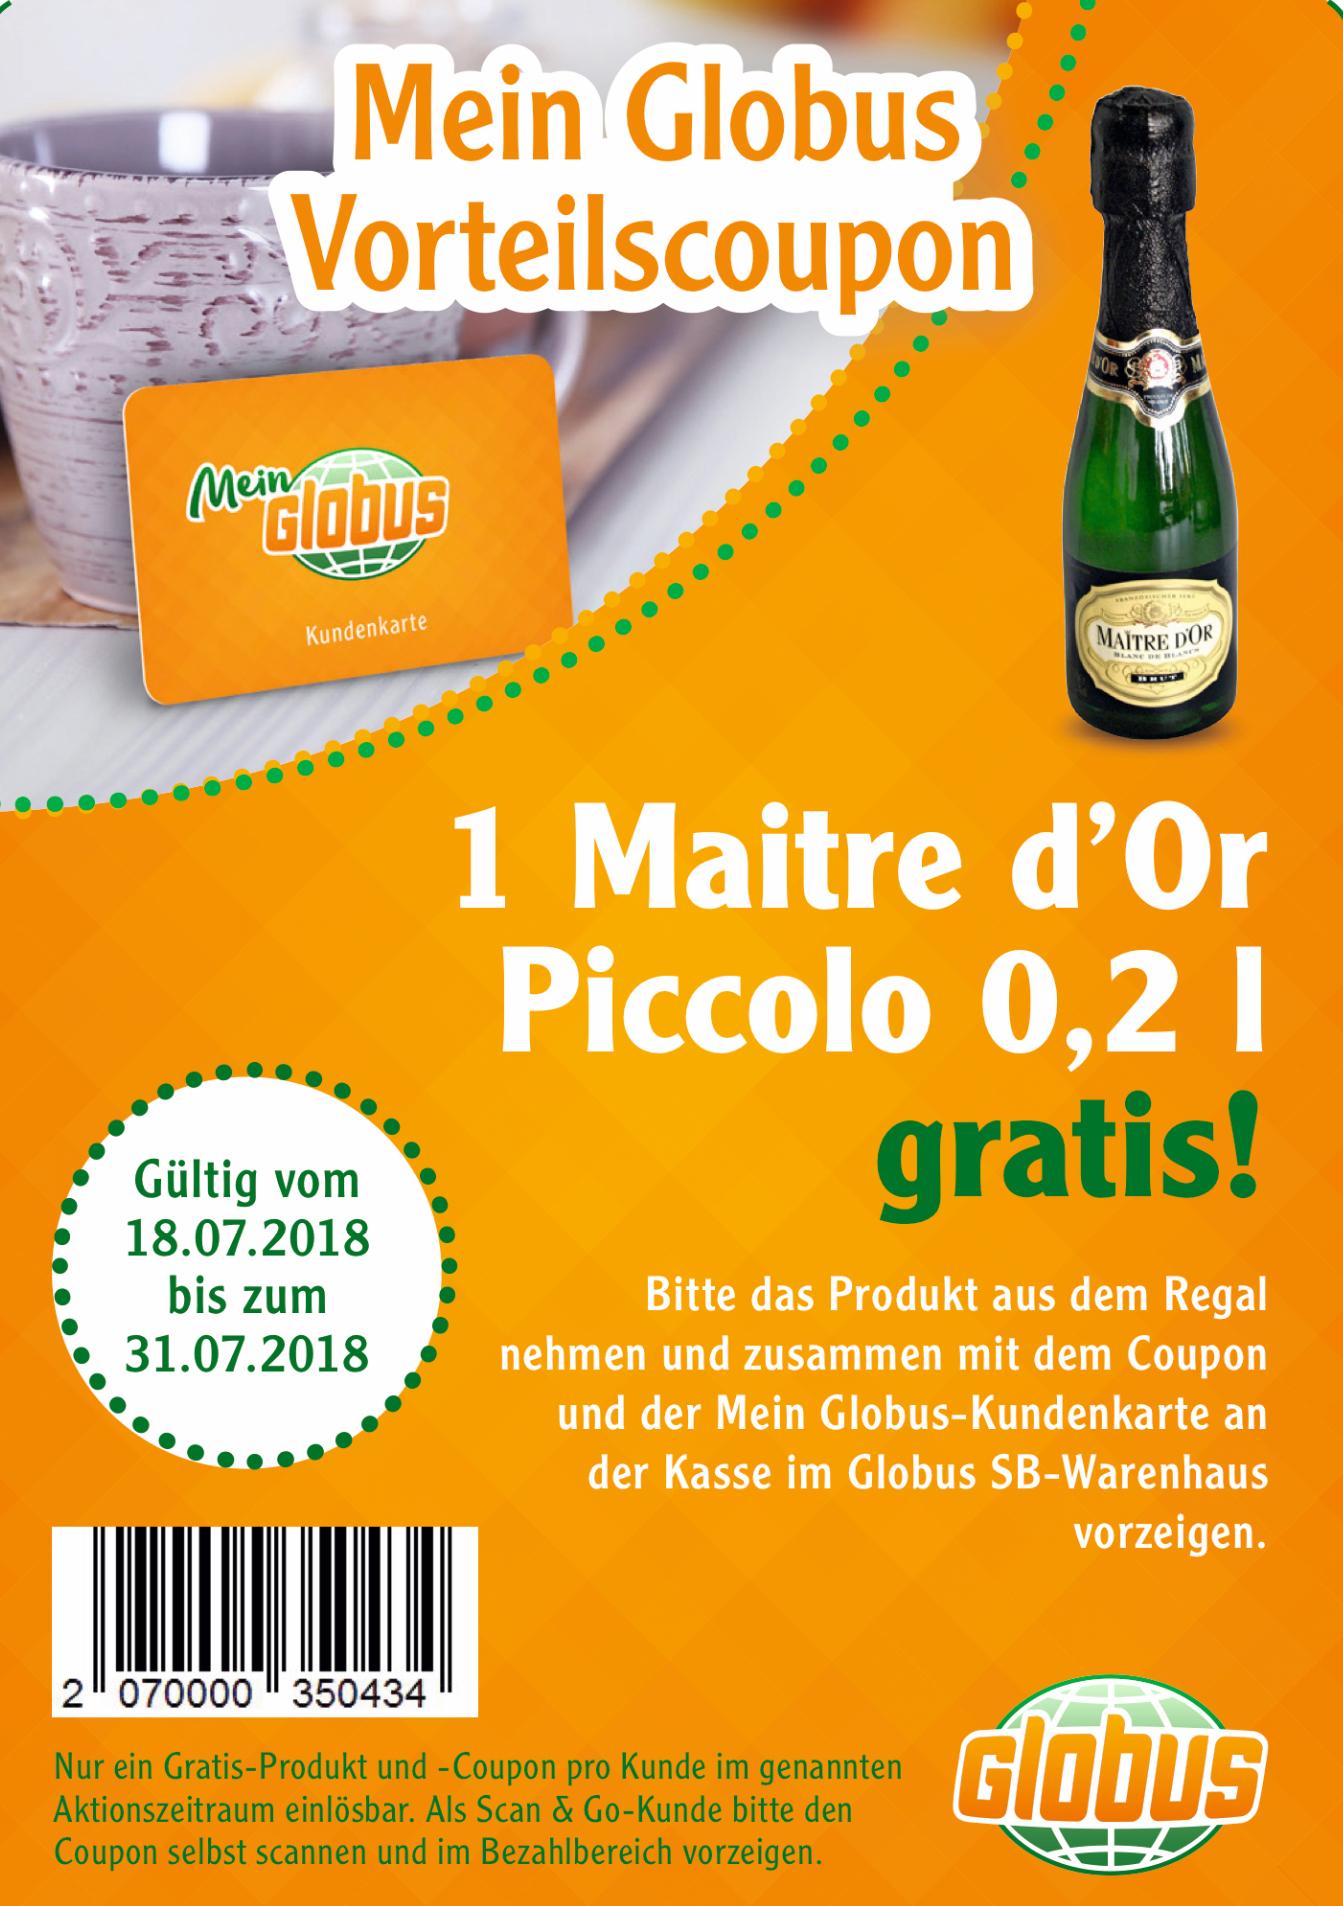 [Globus Freebie]  1 Flasche Piccolo Maitre d'Or mit Kundenkarte